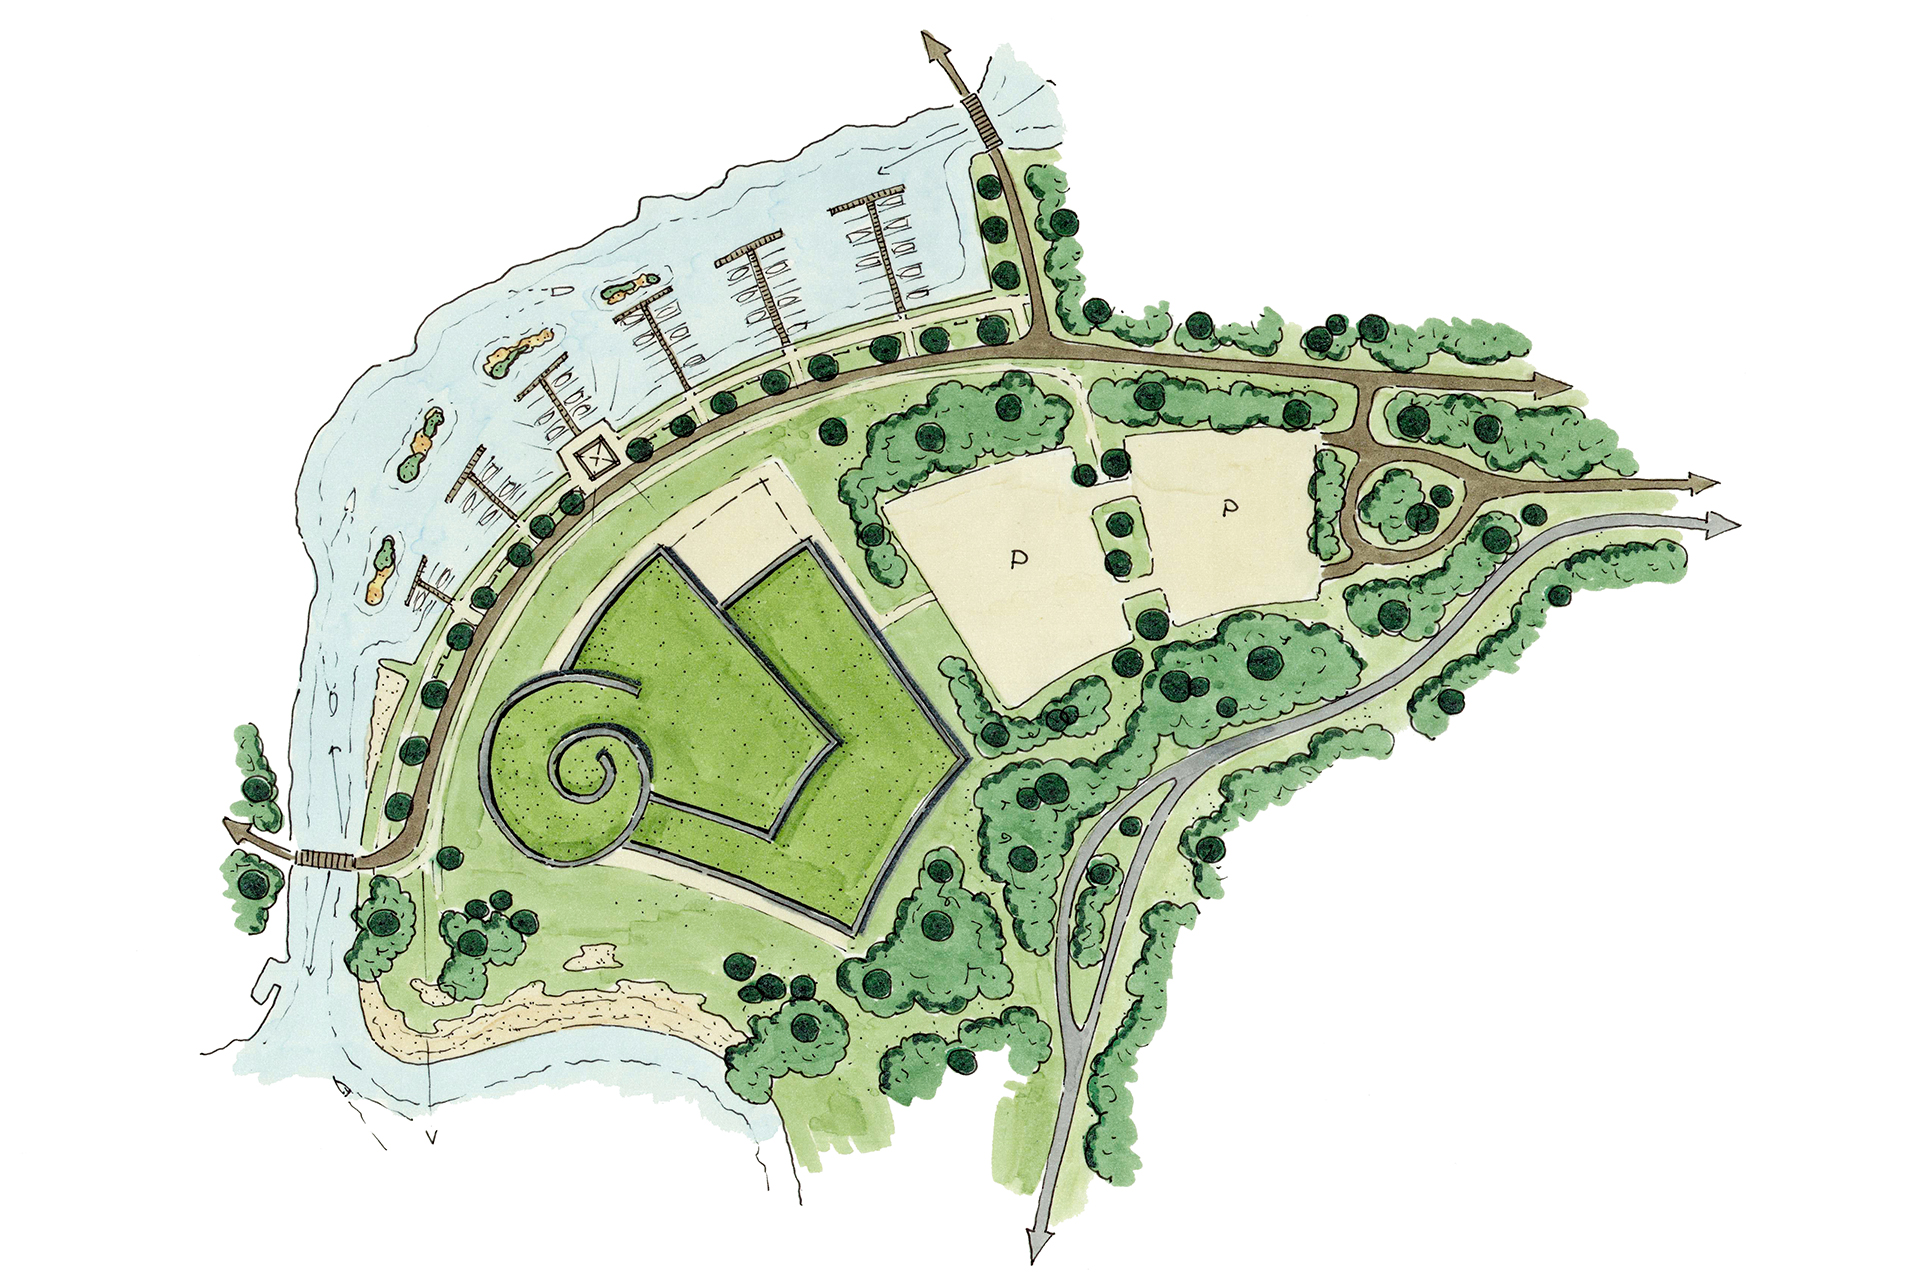 Ter Hills Holiday Resort (België) - architectuur planconcept schets centrumgebouw